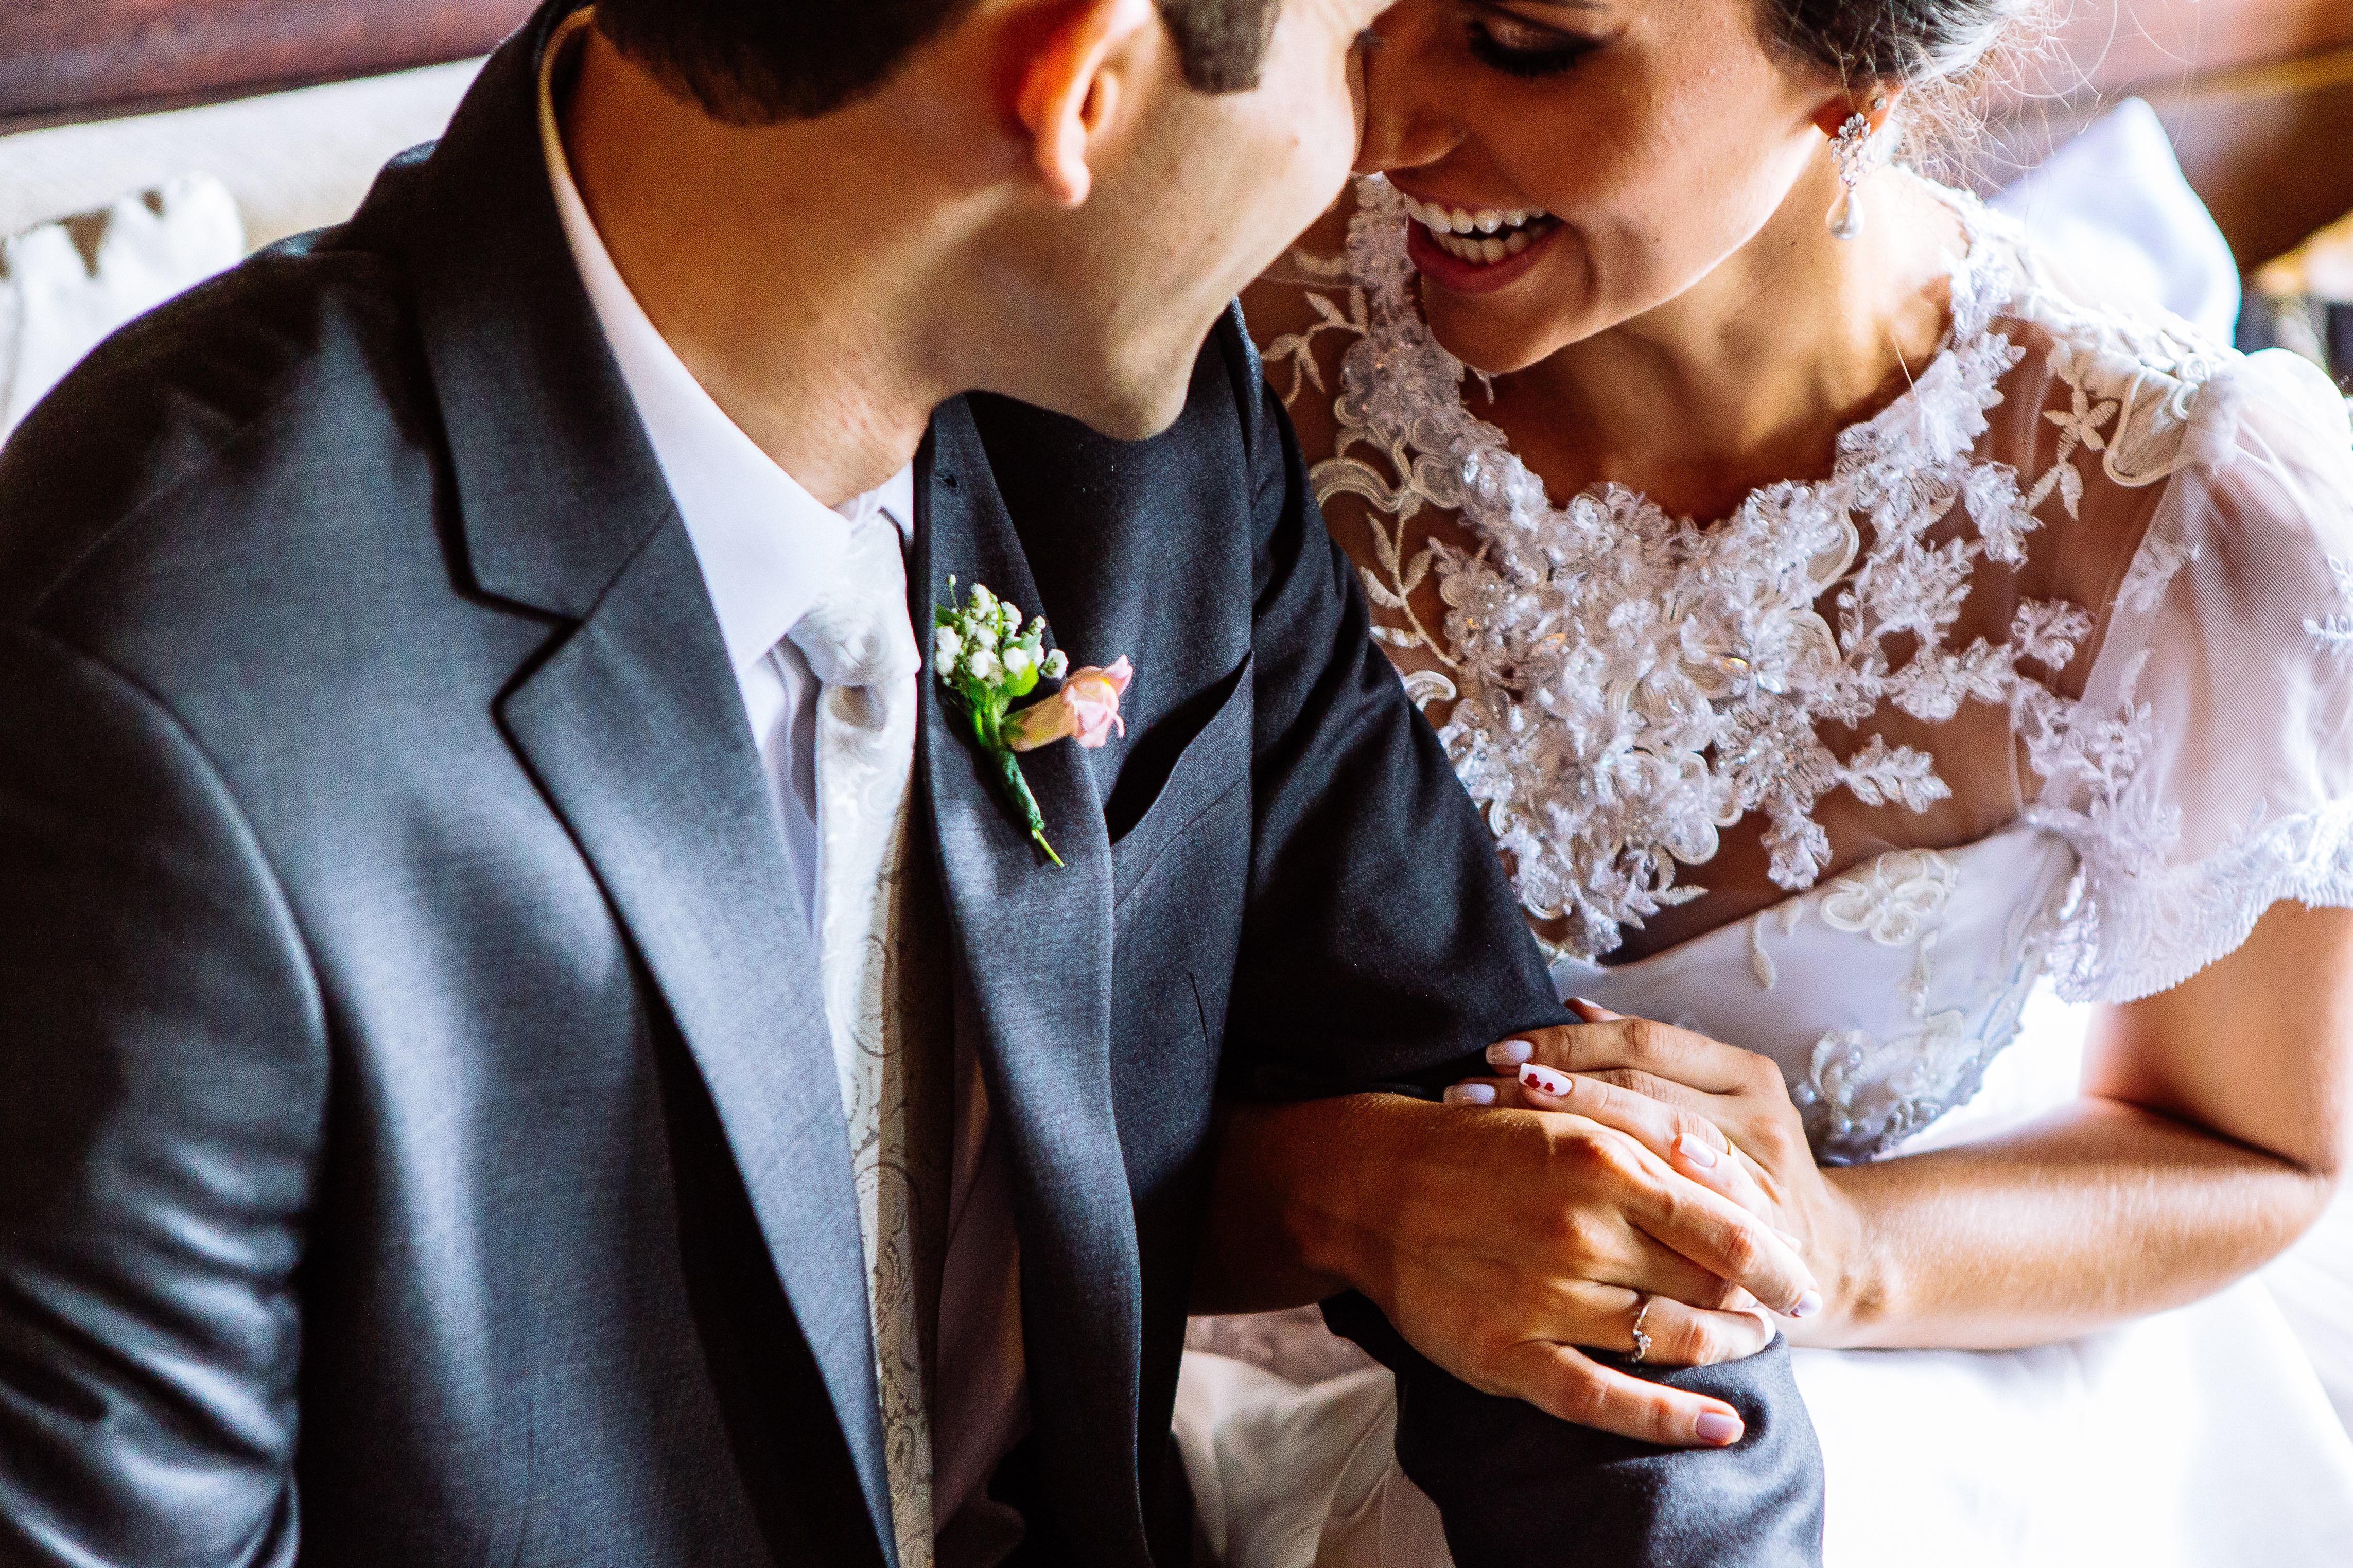 Contate Fotografo de Casamentos e Formaturas | POA-RS Brasil